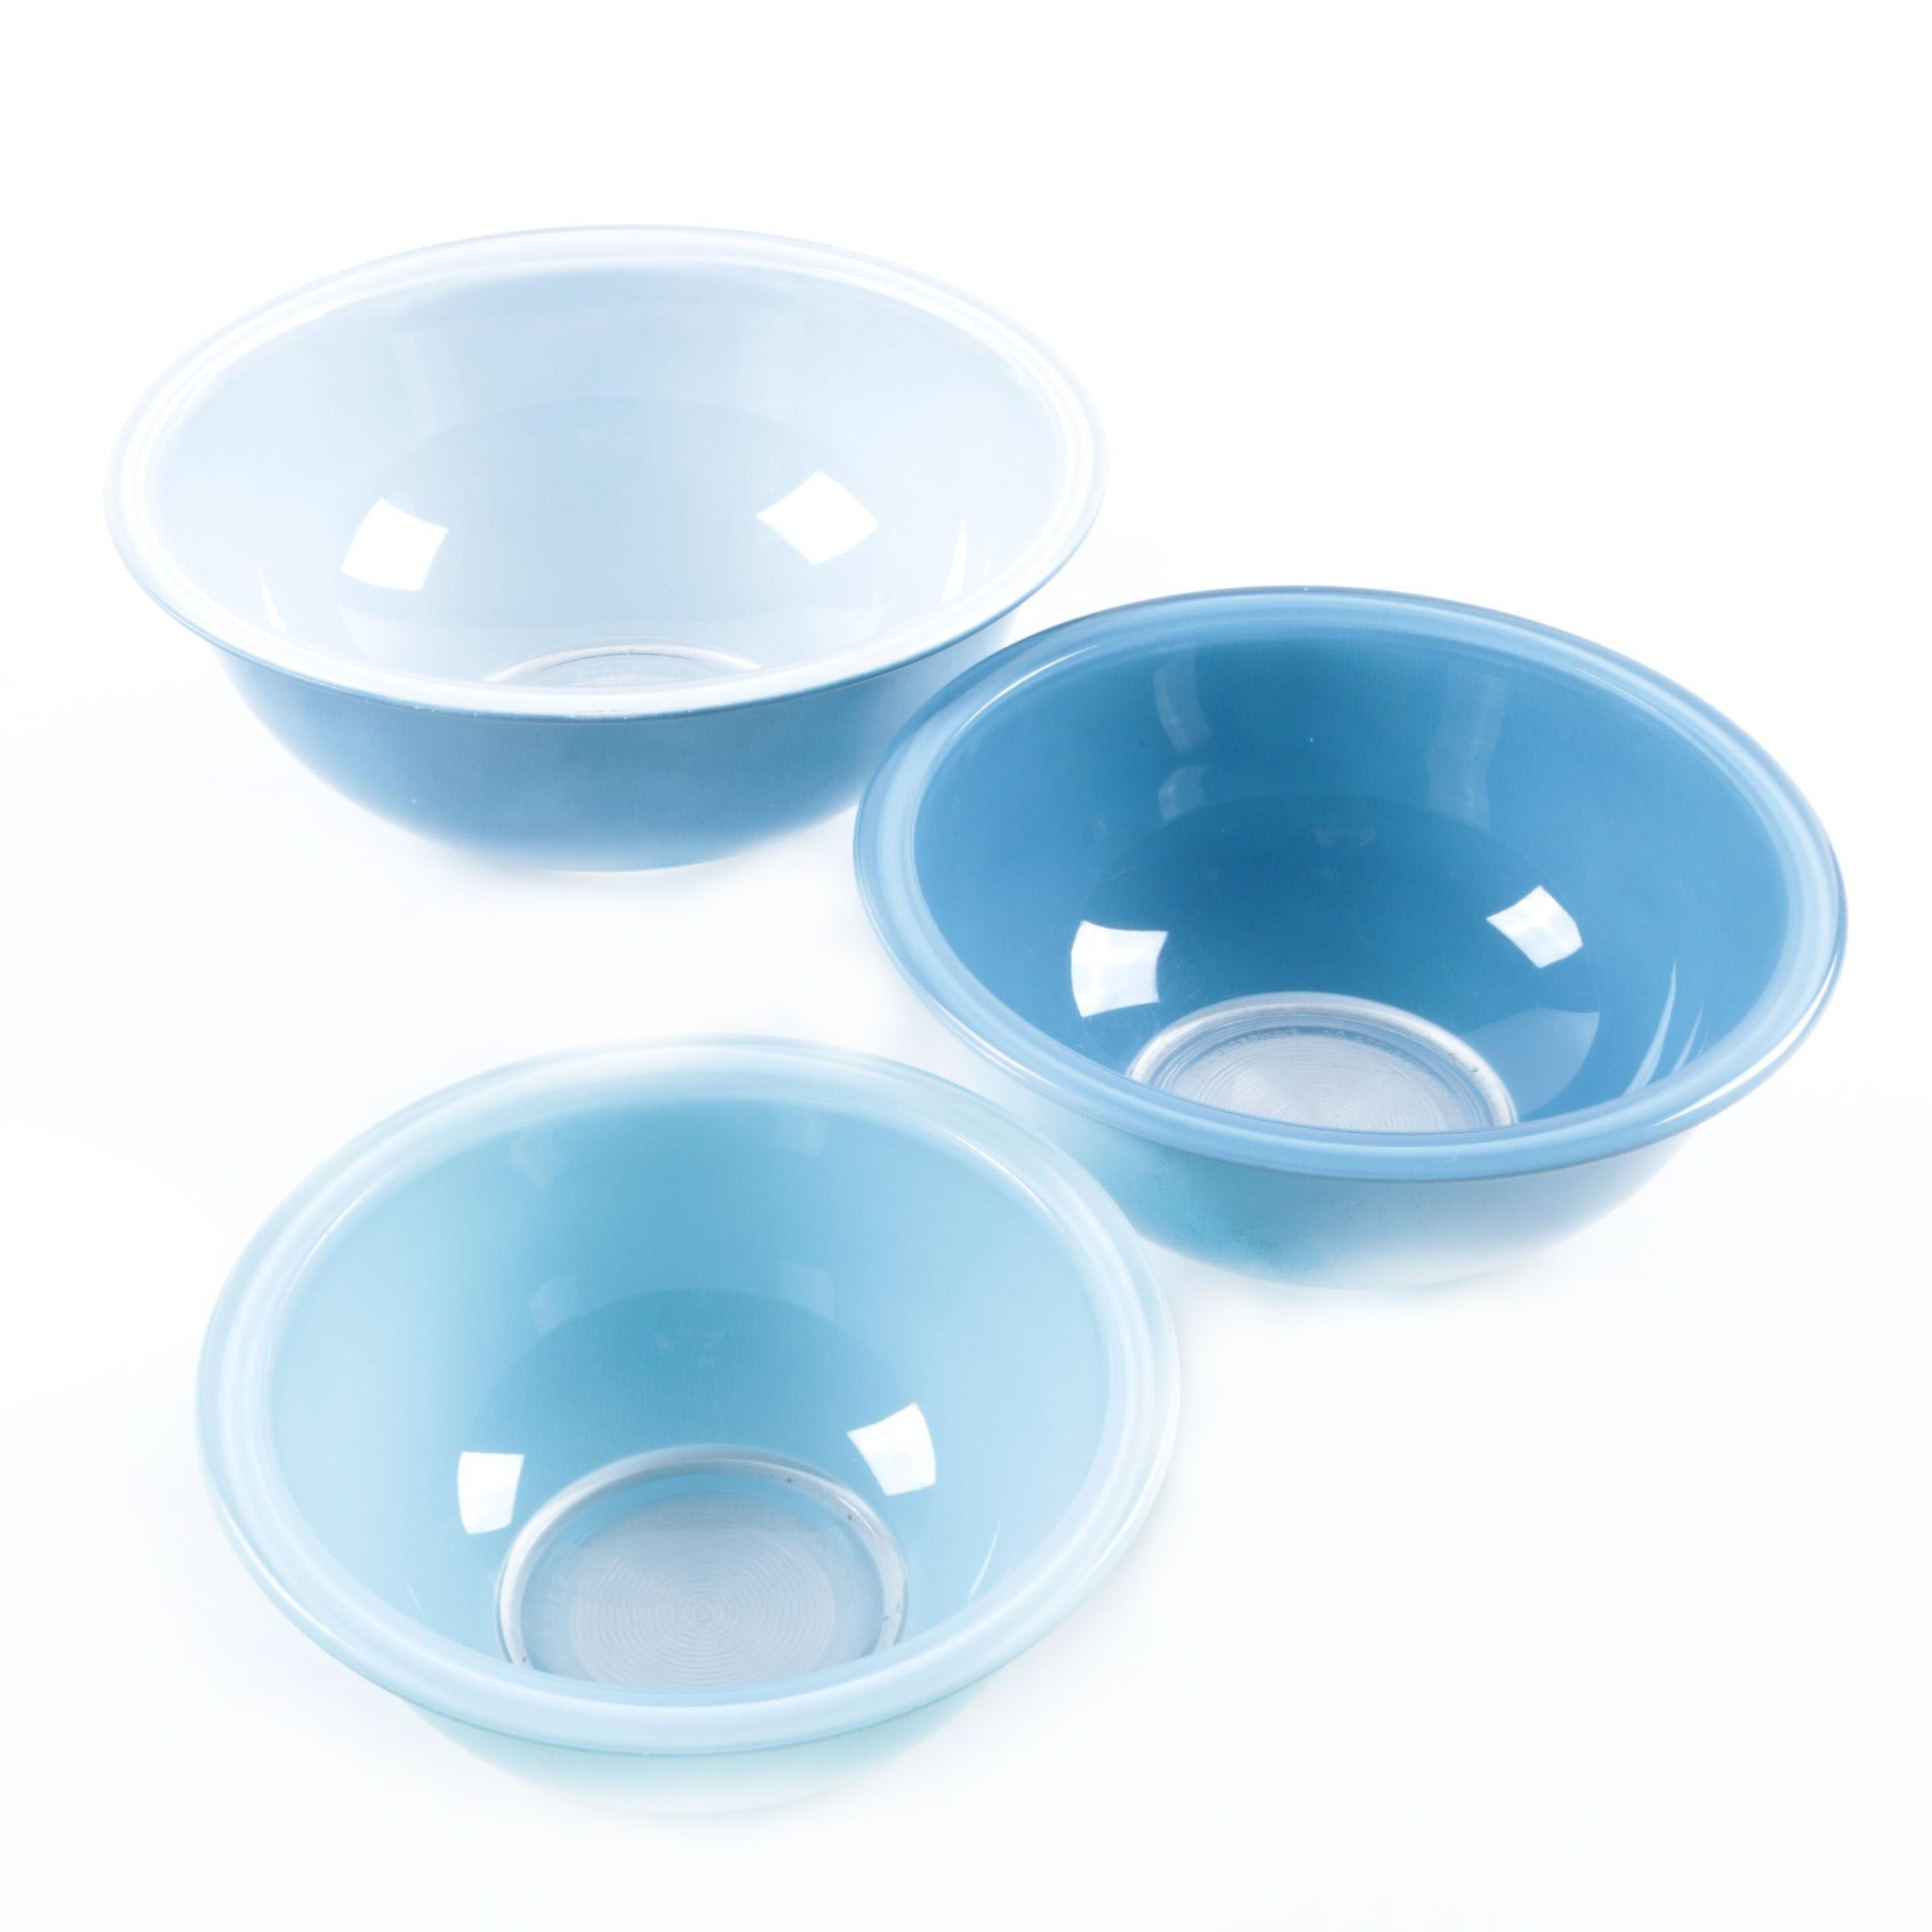 Vintage Pyrex Blue Nesting Bowls 1980s